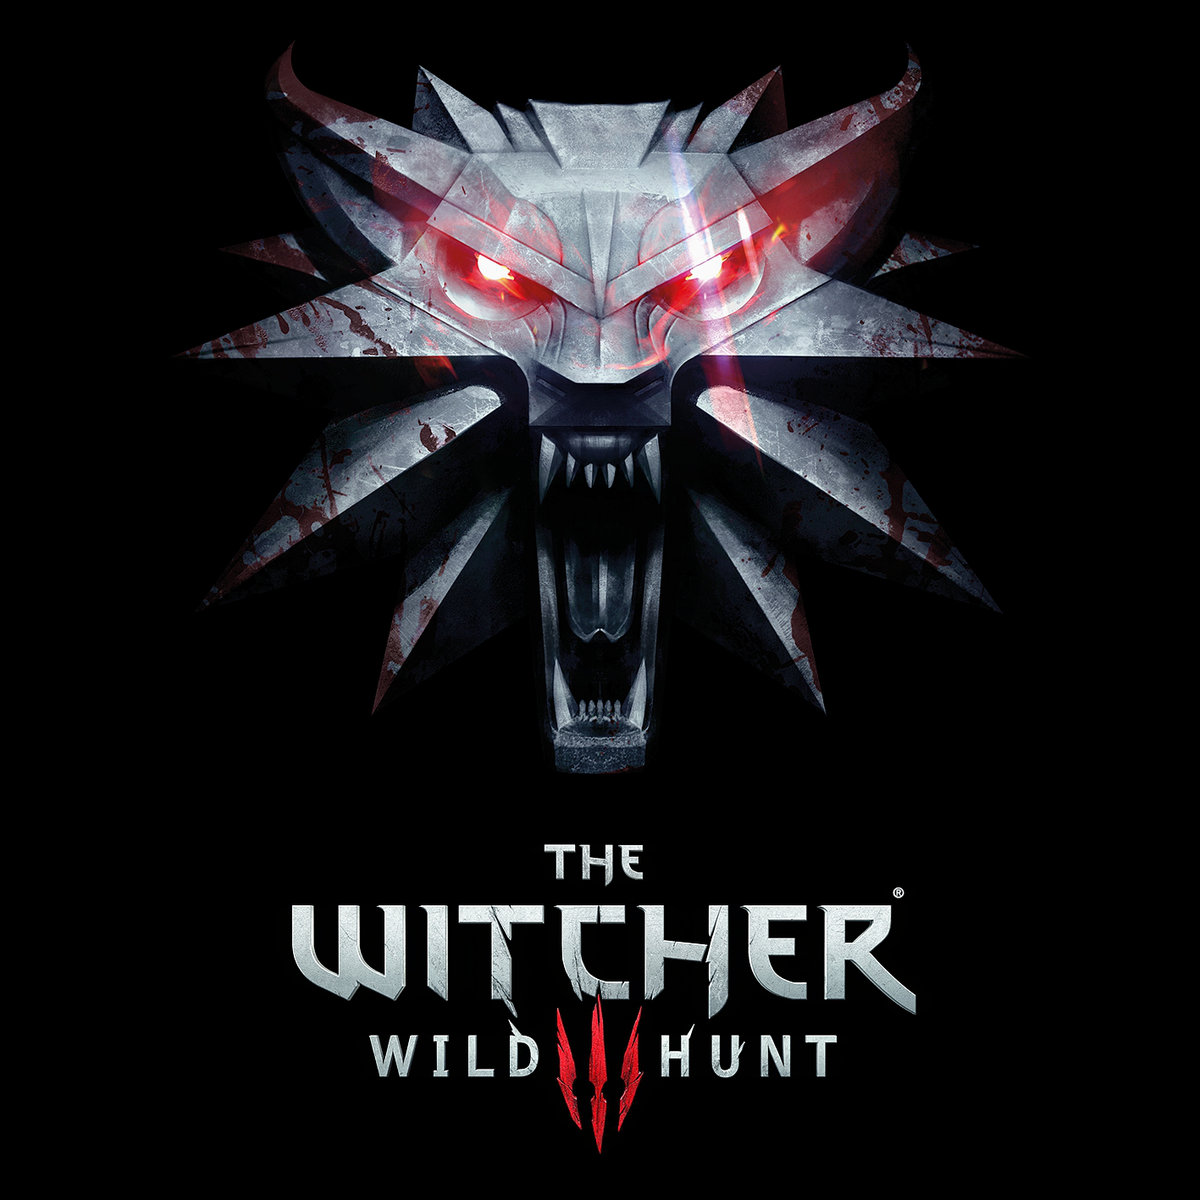 The witcher 3: wild hunt original game soundtrack музыка из игры.